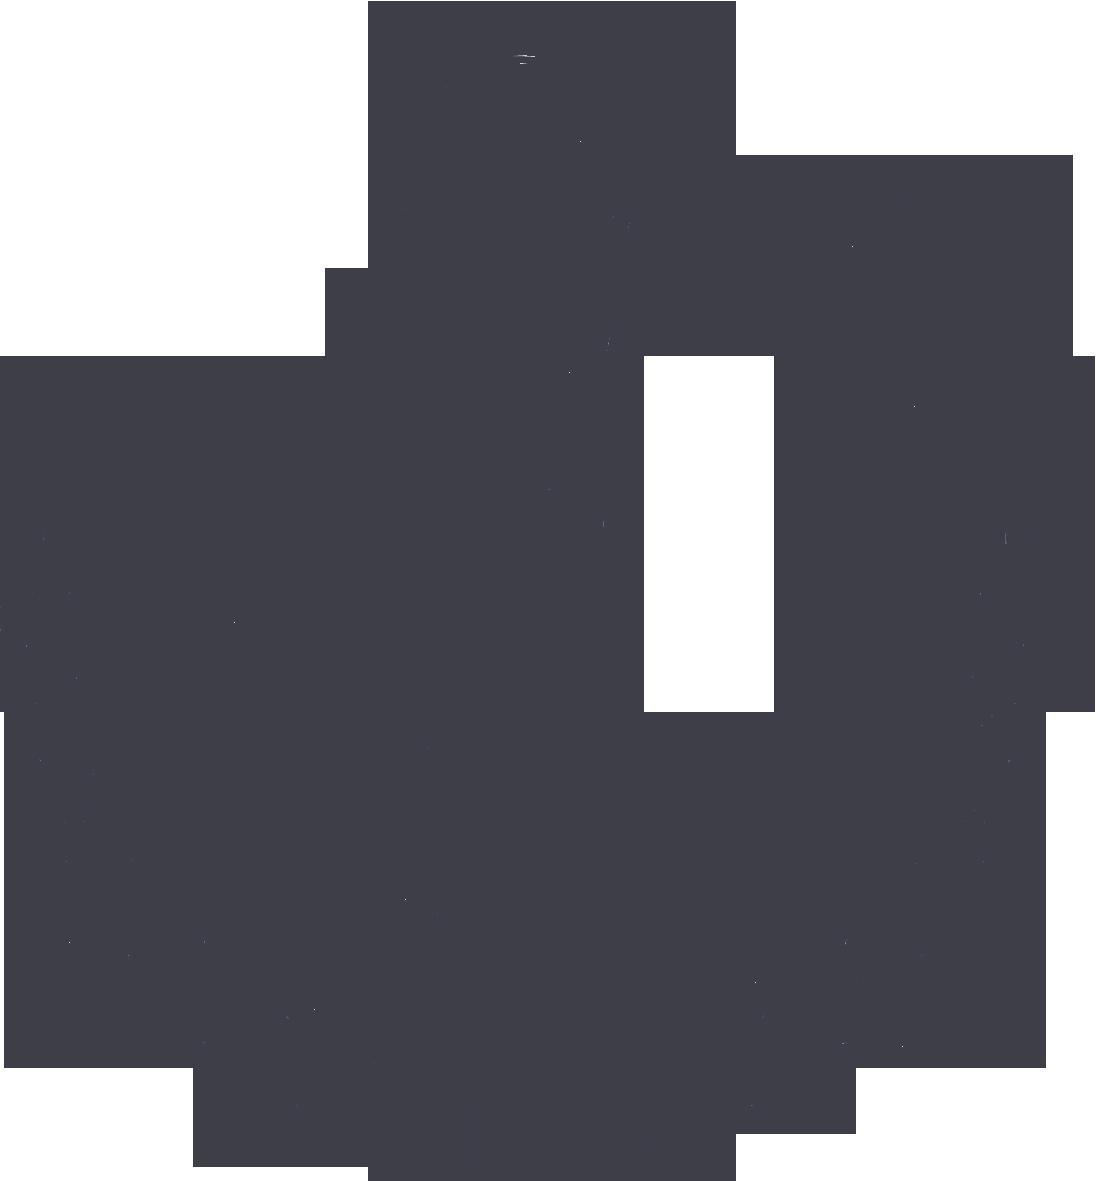 Laws federalism